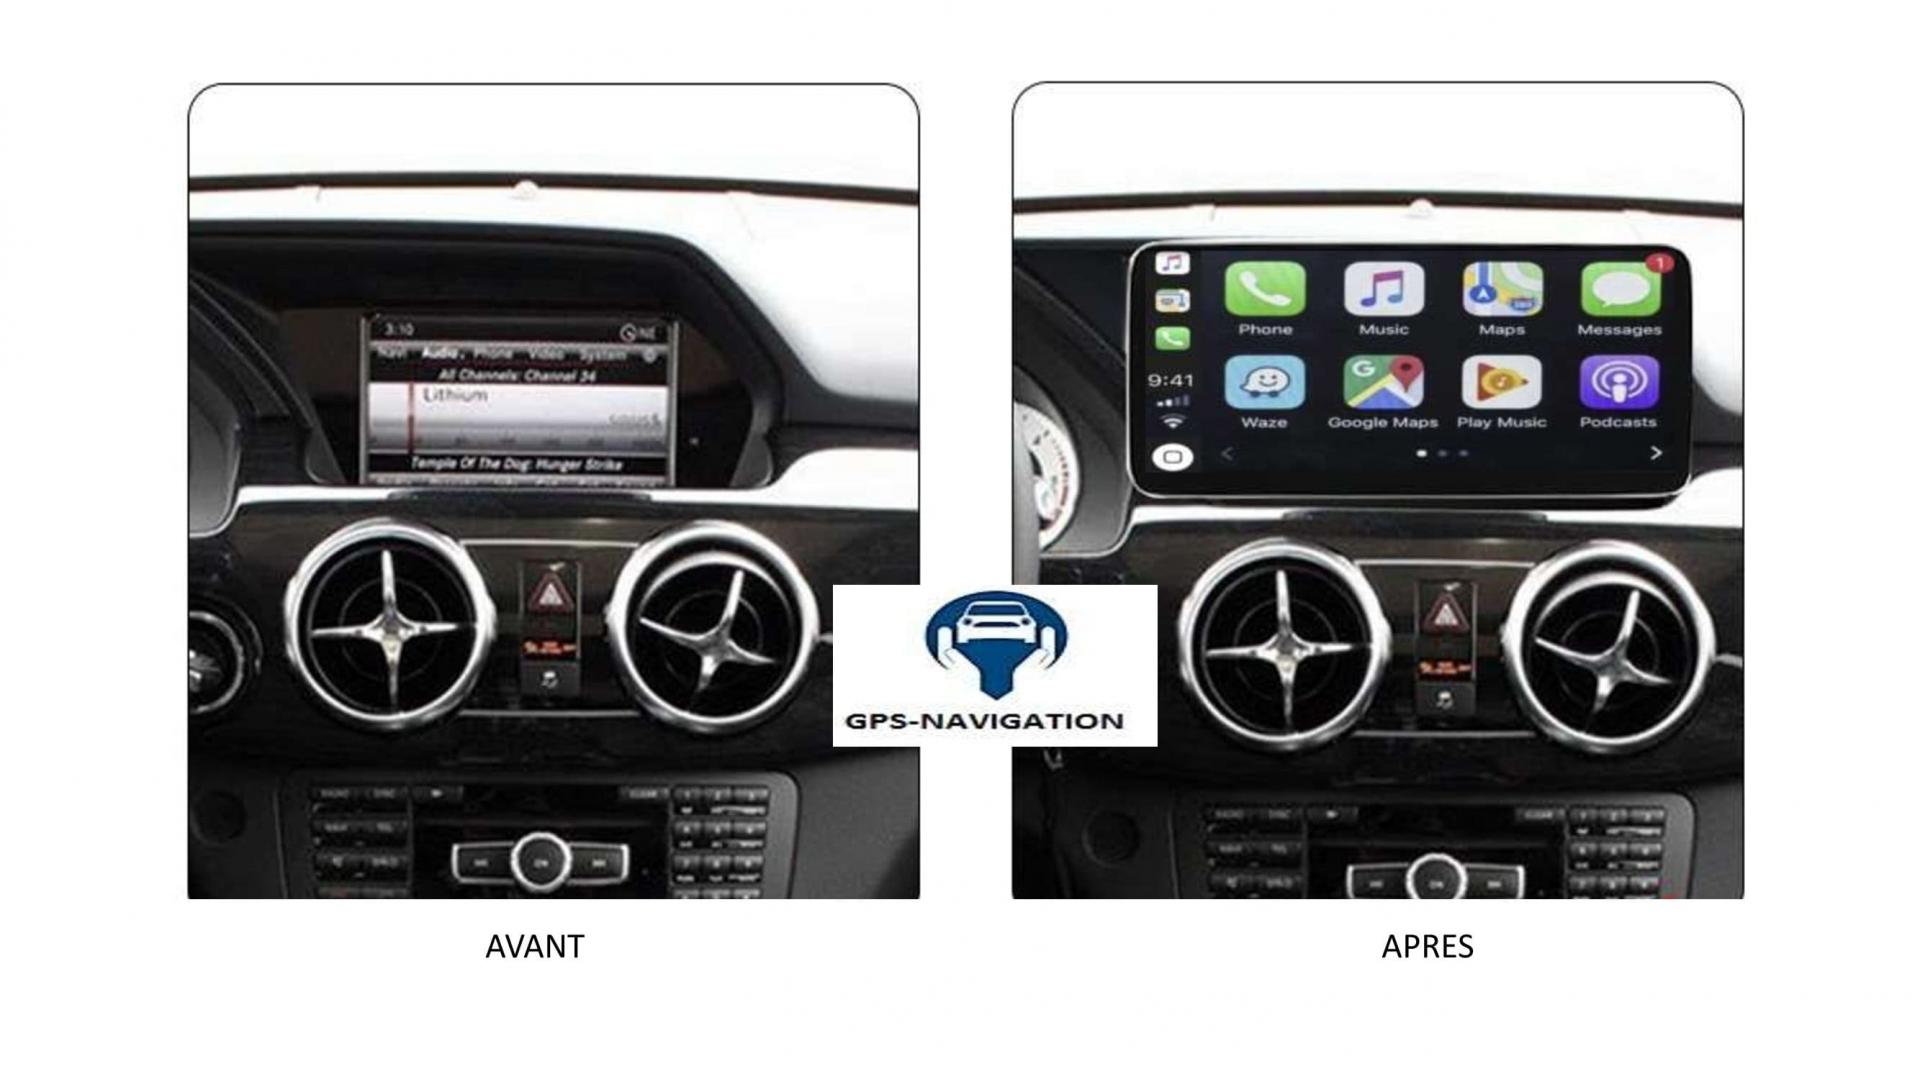 Mercedes glk x204 autoradio gps carplay android auto bluetooth 5